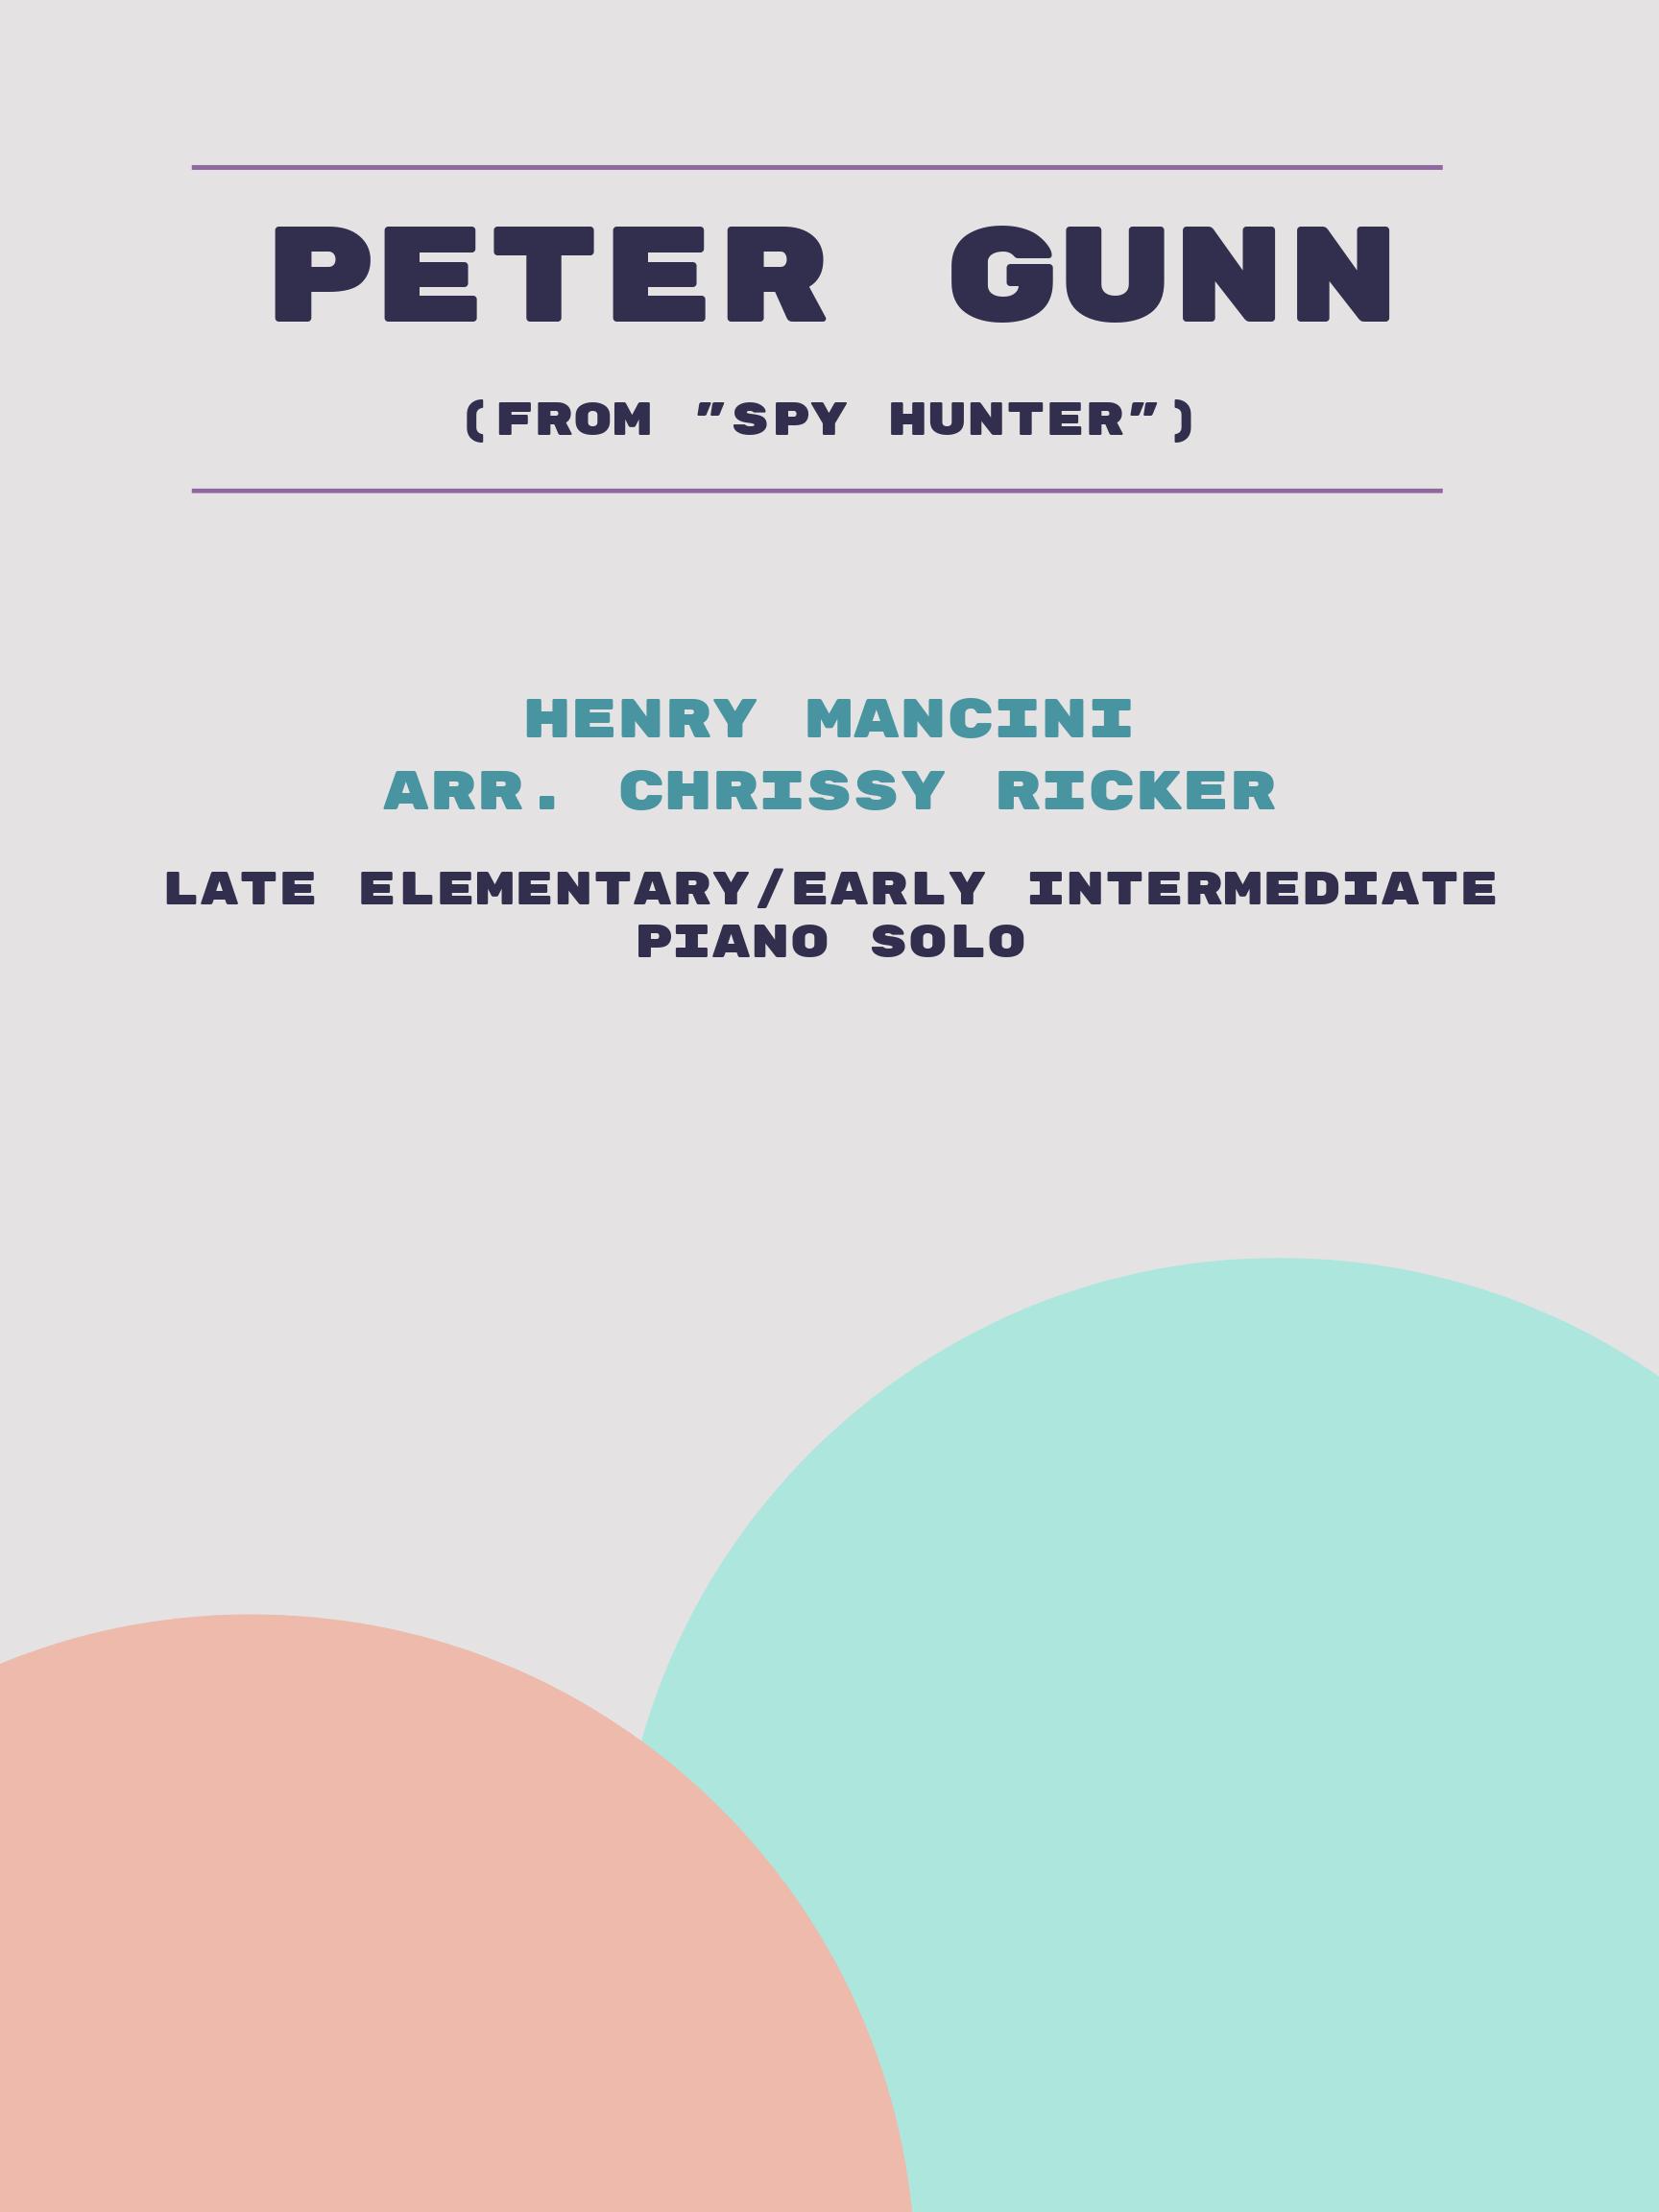 Peter Gunn by Henry Mancini